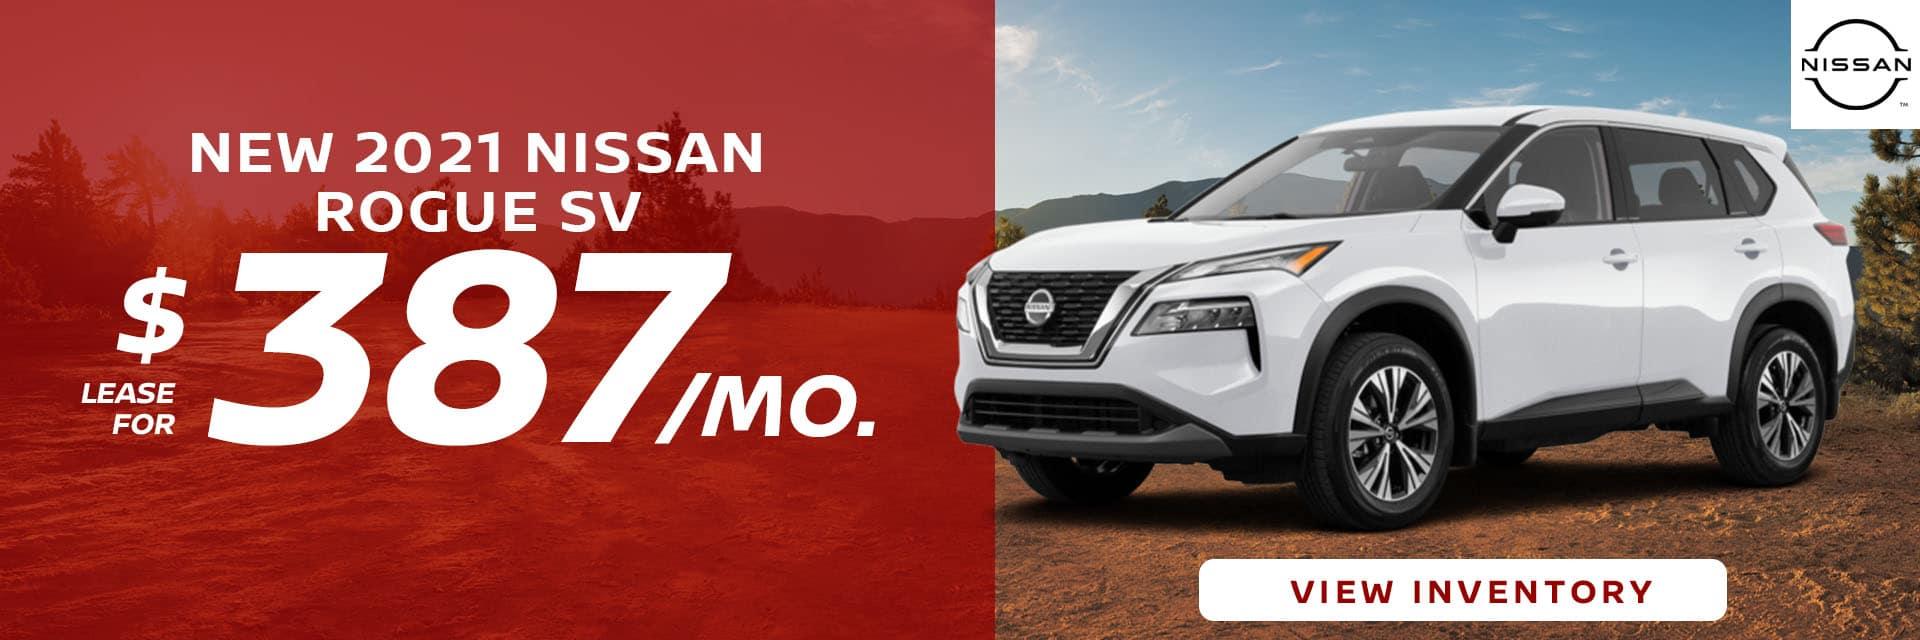 CNSN-July 2021-2021 Nissan Rogue copy